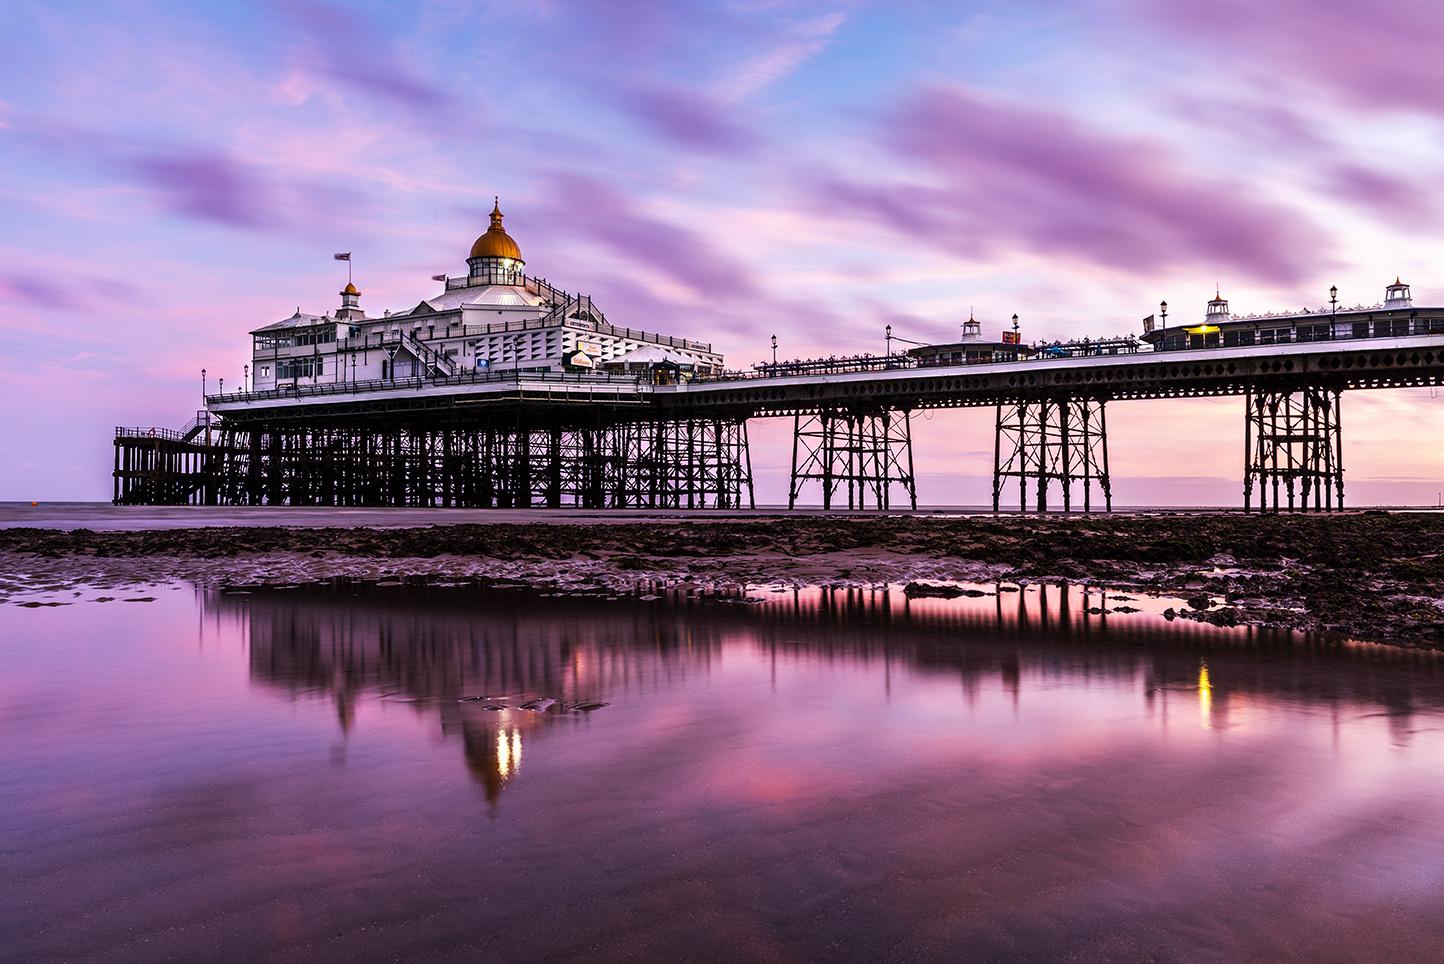 Purple Pier by Simon Anderson